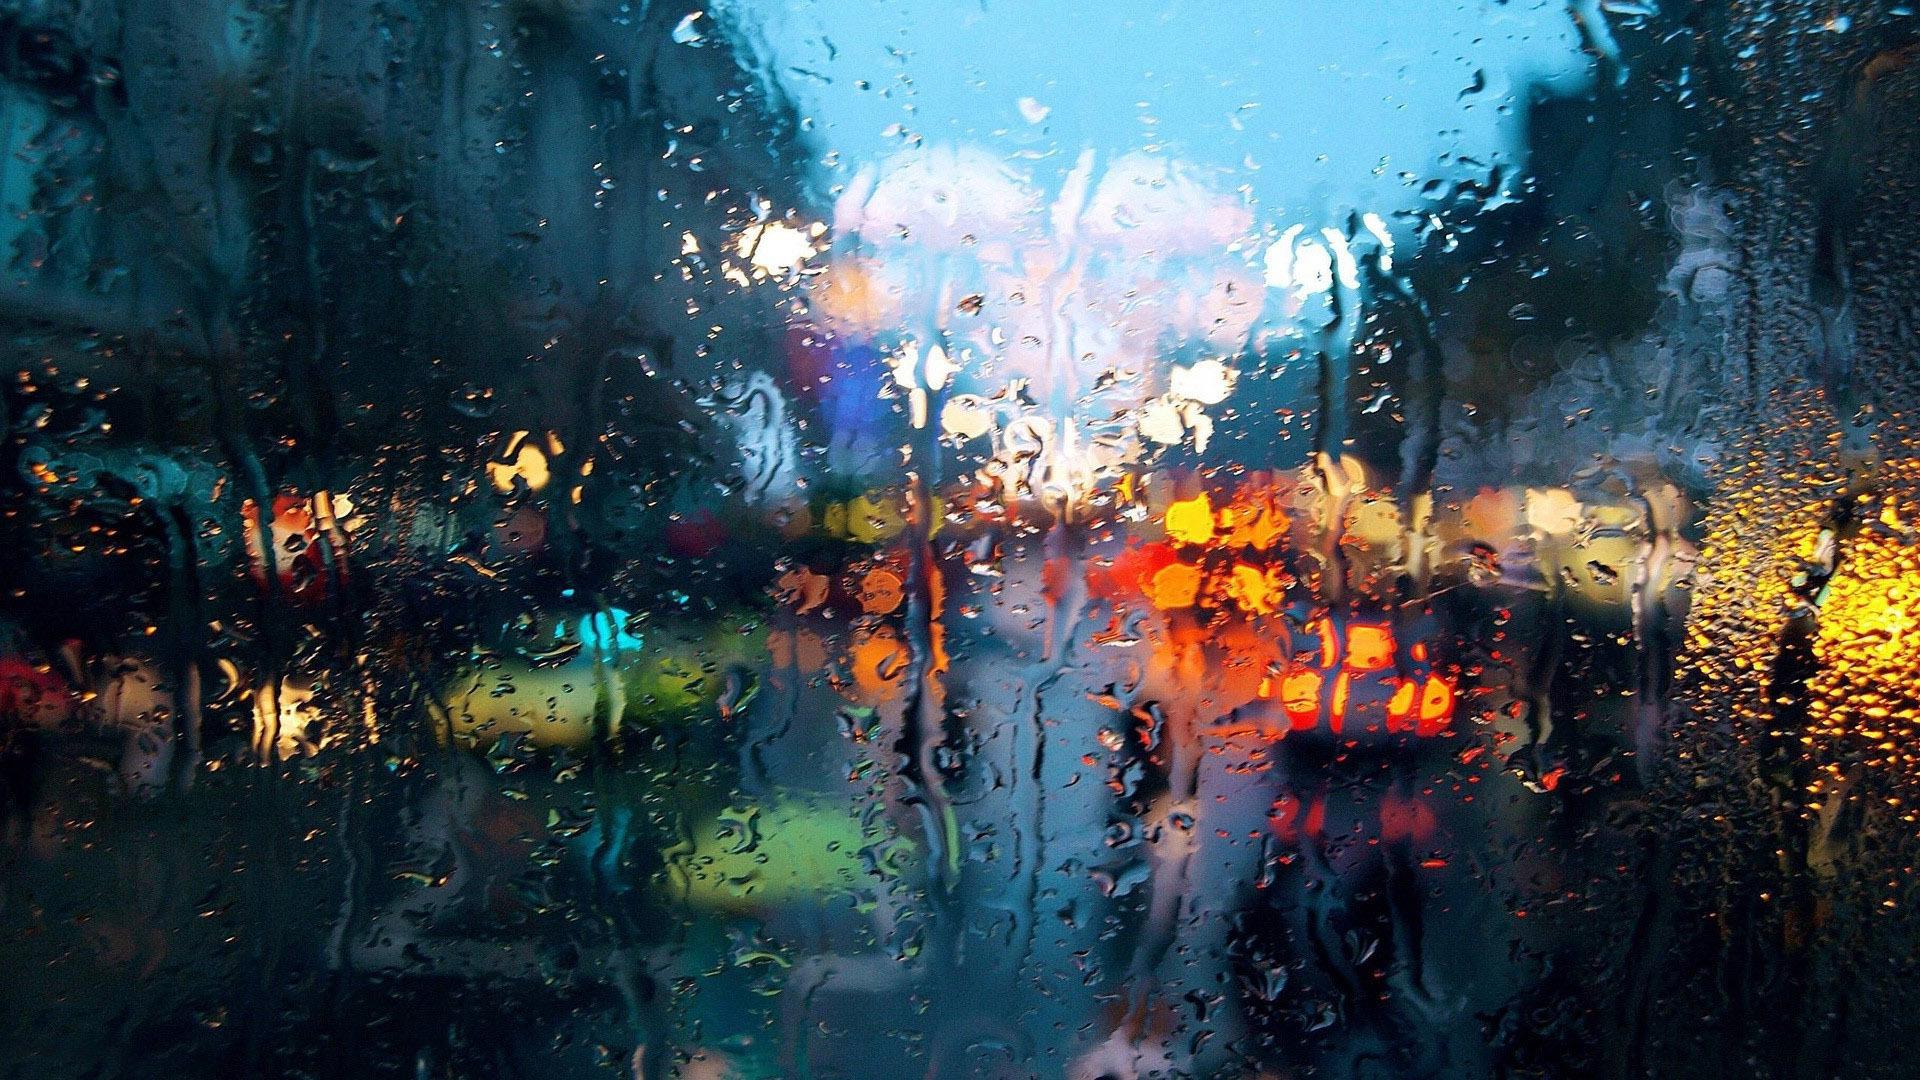 Wet Window Photography Hd Wallpaper 19201080 46482jpg